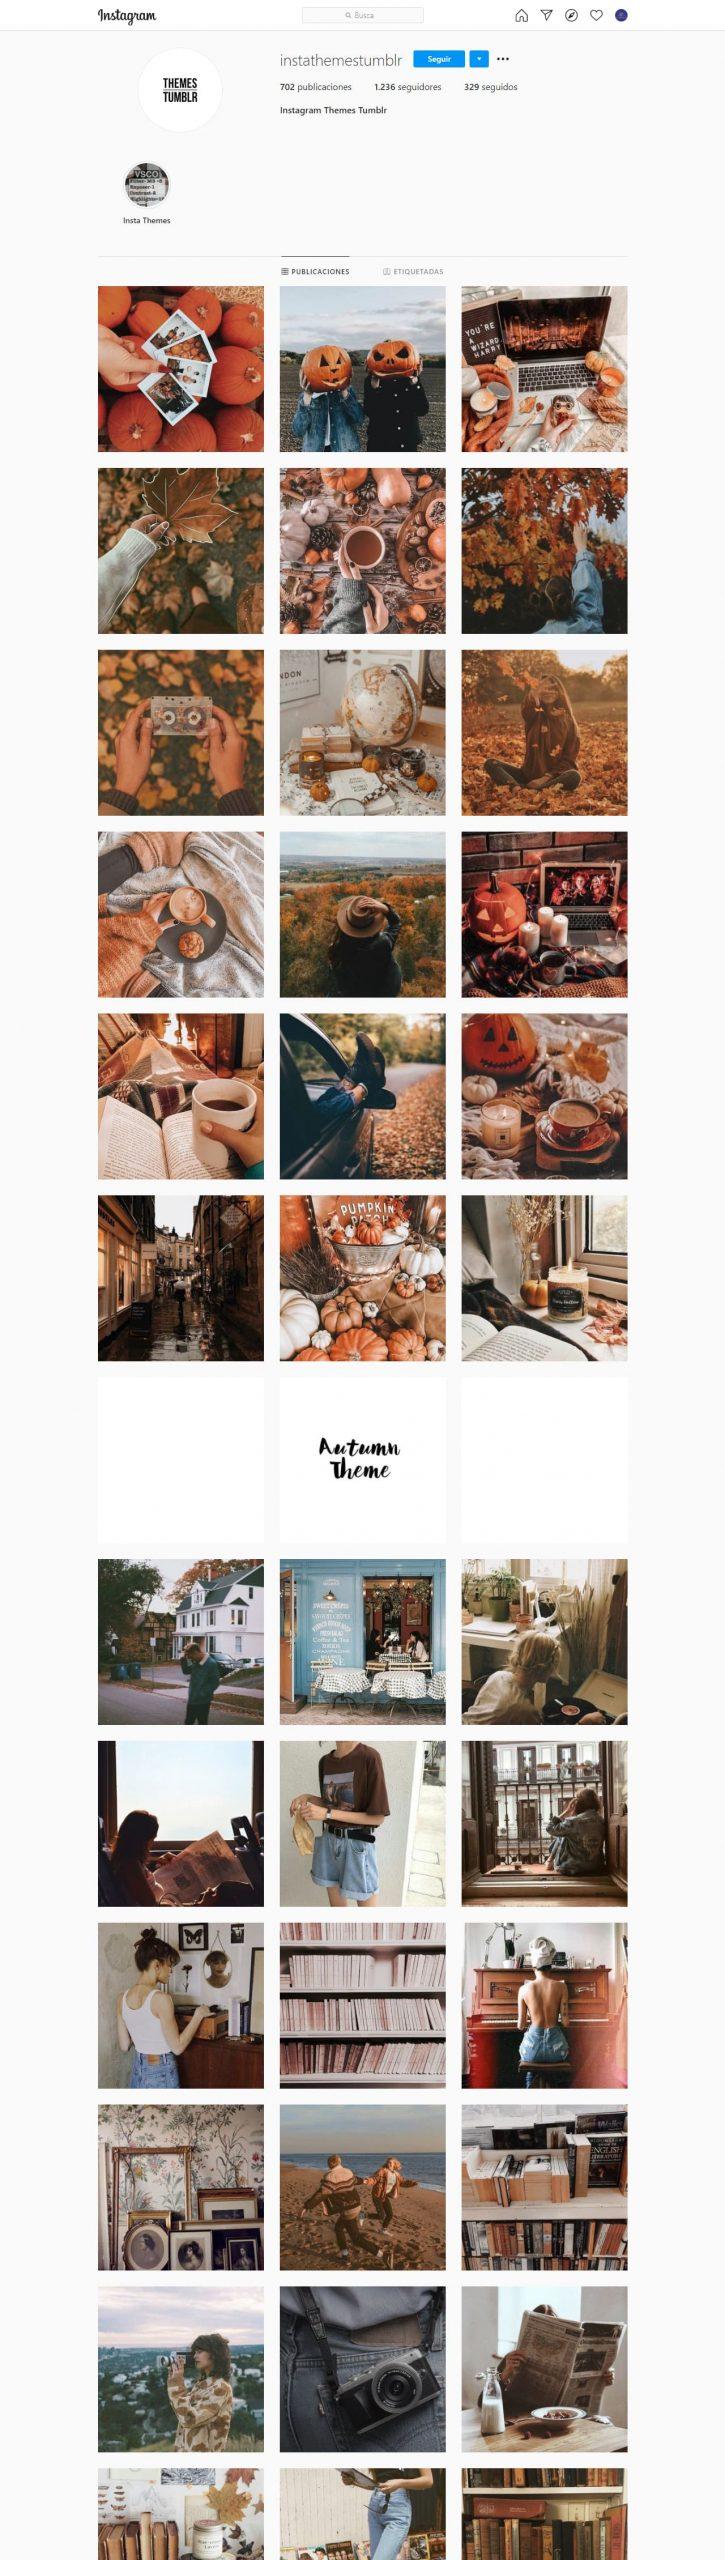 Instathemetumblr Feed Instagram